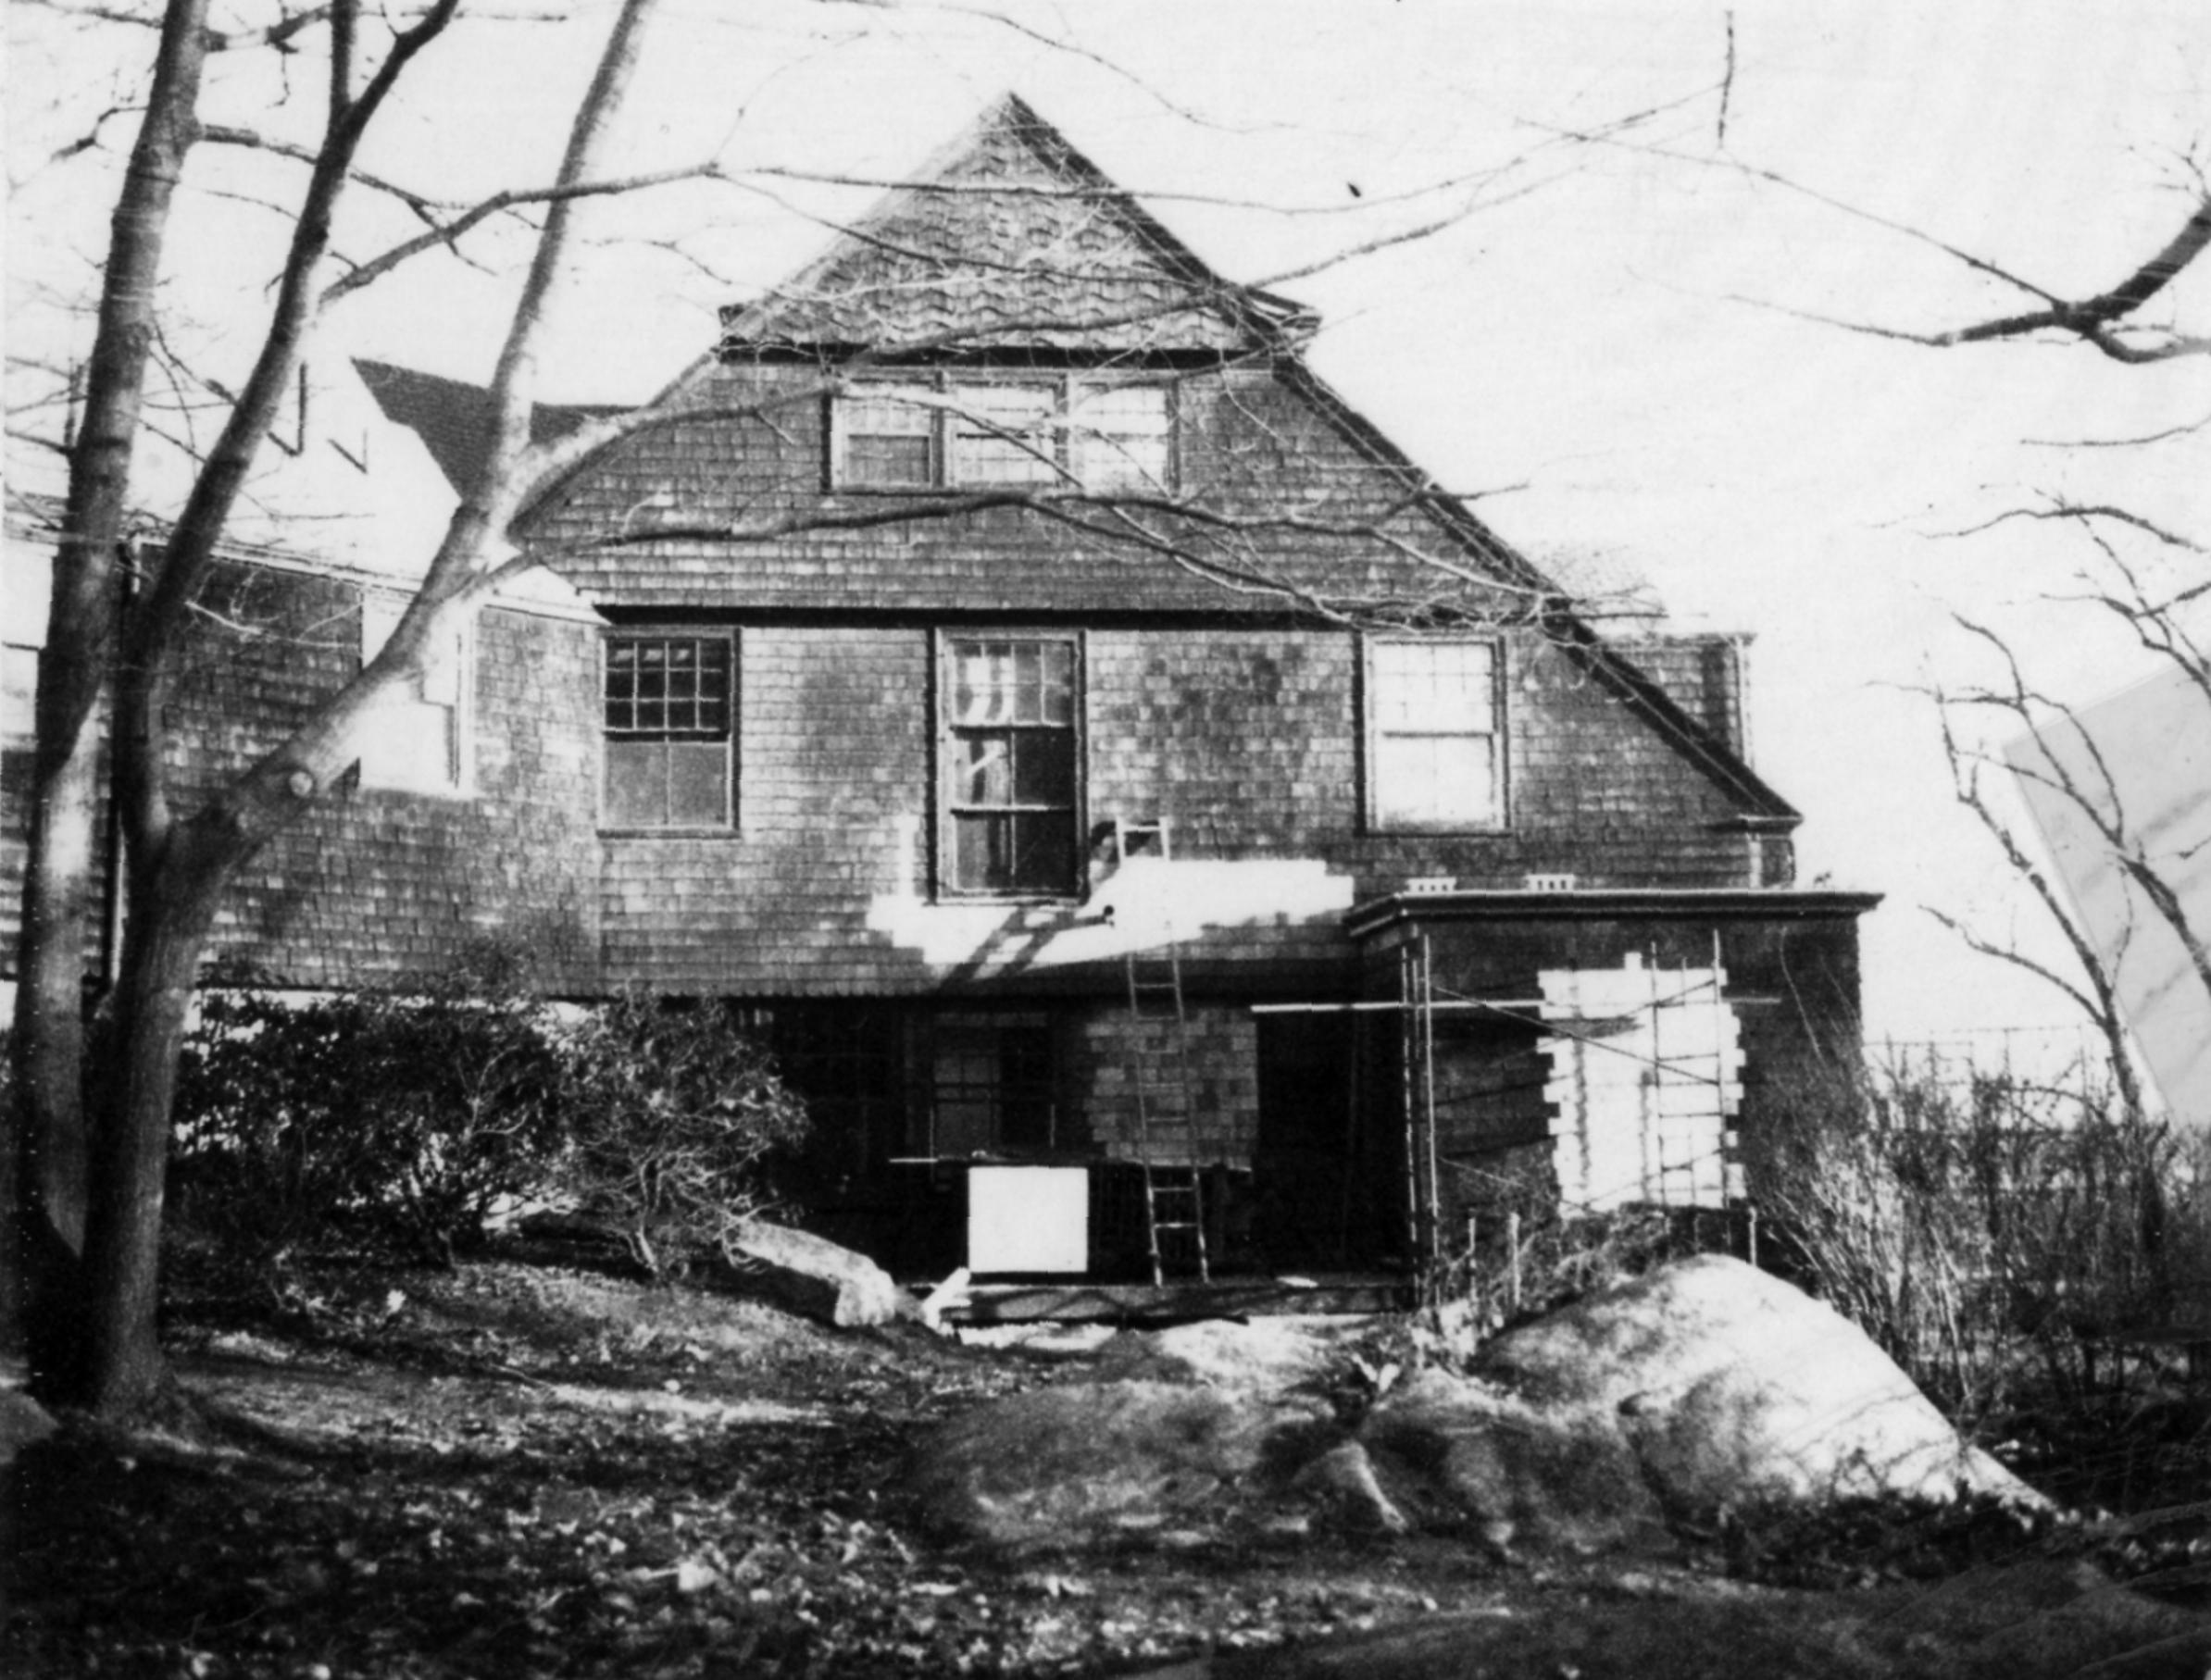 Before renovation